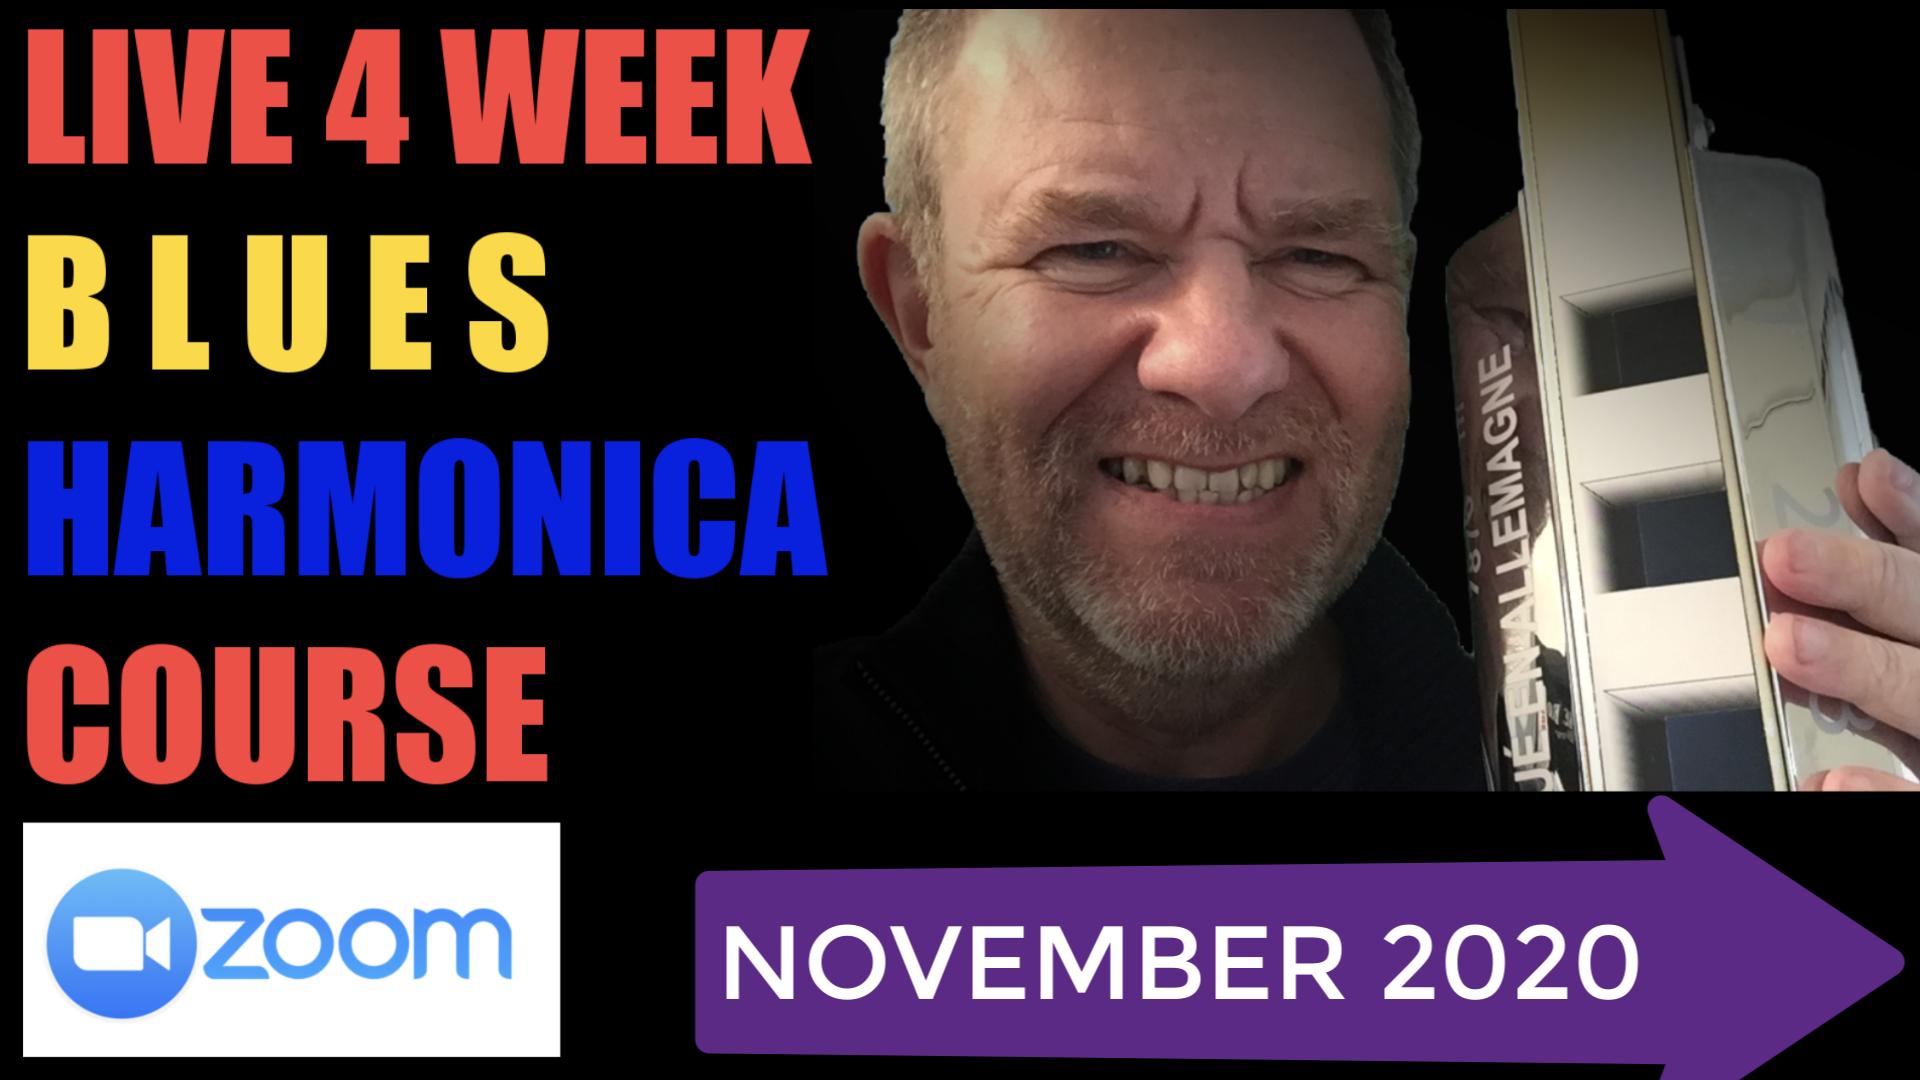 Ben Hewlett Harmonica live classes in november